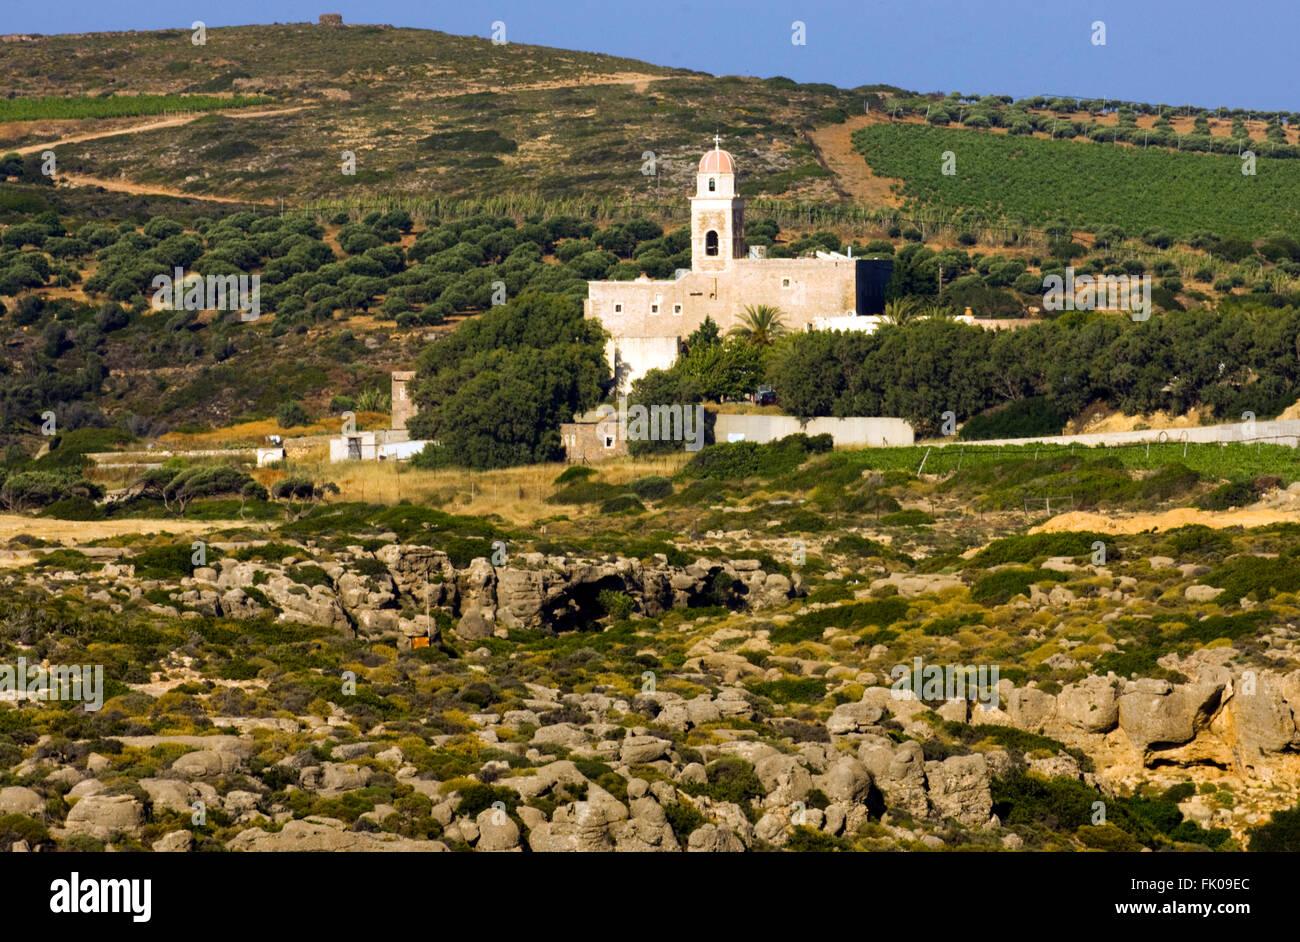 "Griechenland, Kreta, Sitia, Kloster Toplou (Toplu), der Name Bedeutet Wörtlich ""Mit der Kanonenkugel"". Stockbild"